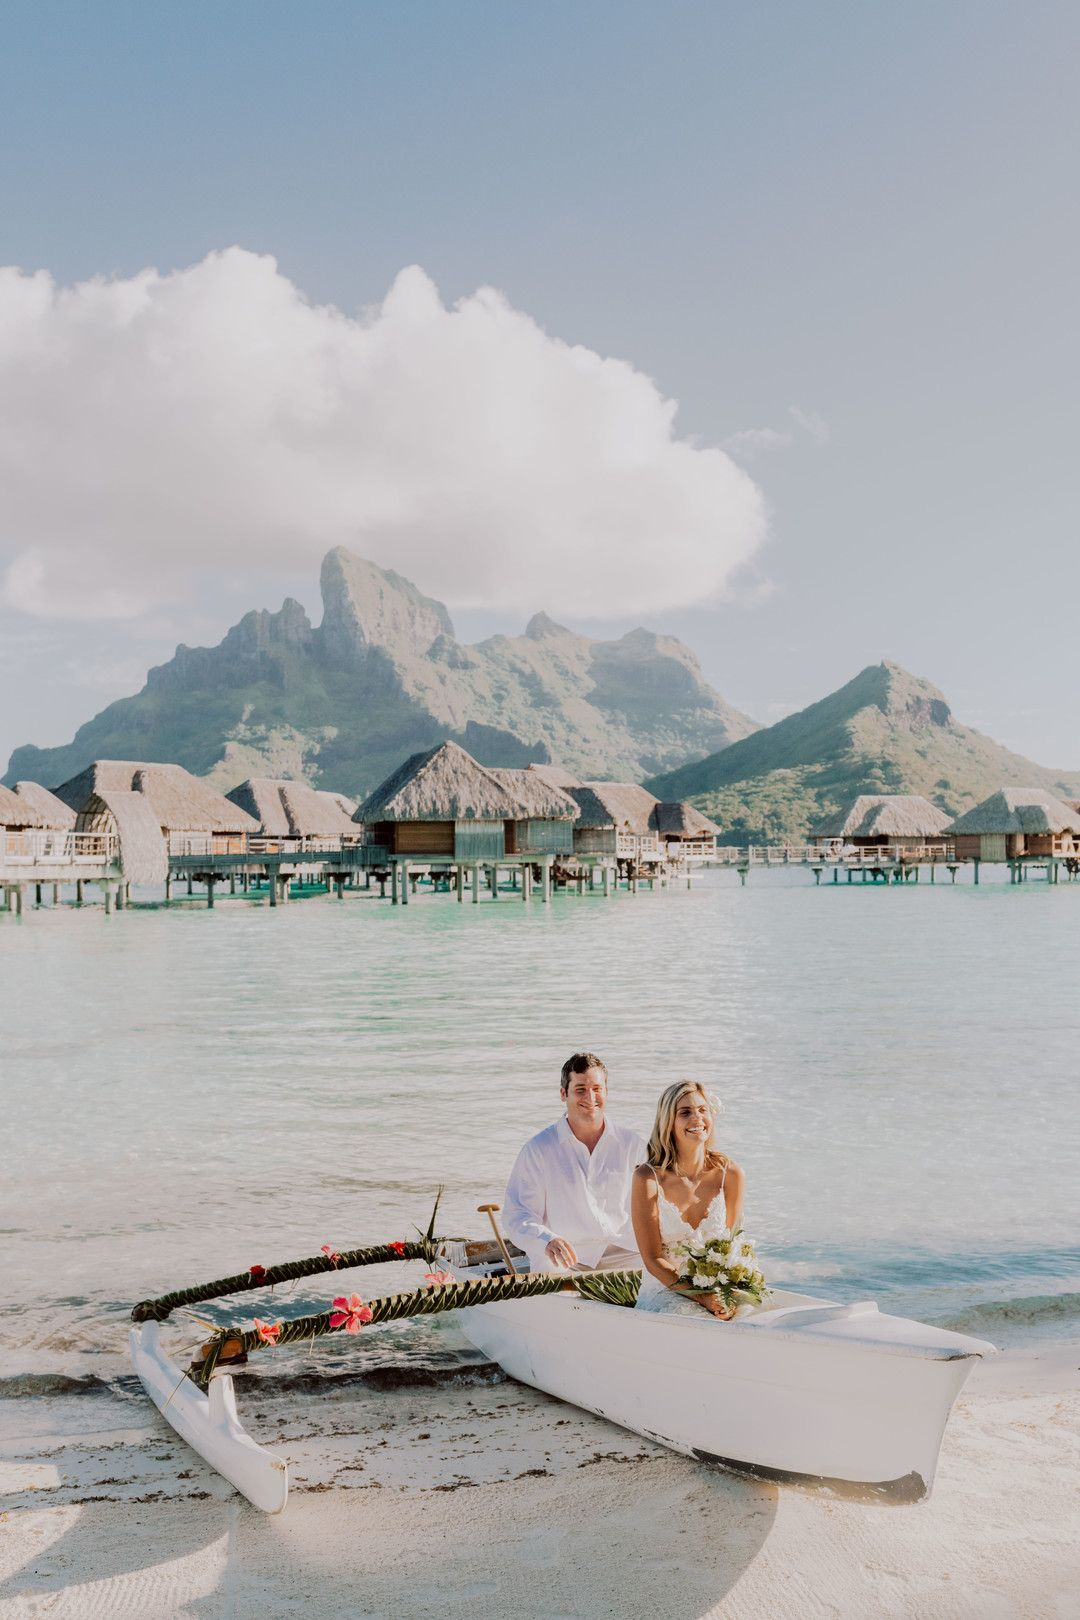 Elopement At The Four Seasons In Bora Bora Bora Bora Wedding Bora Bora Honeymoon Pictures